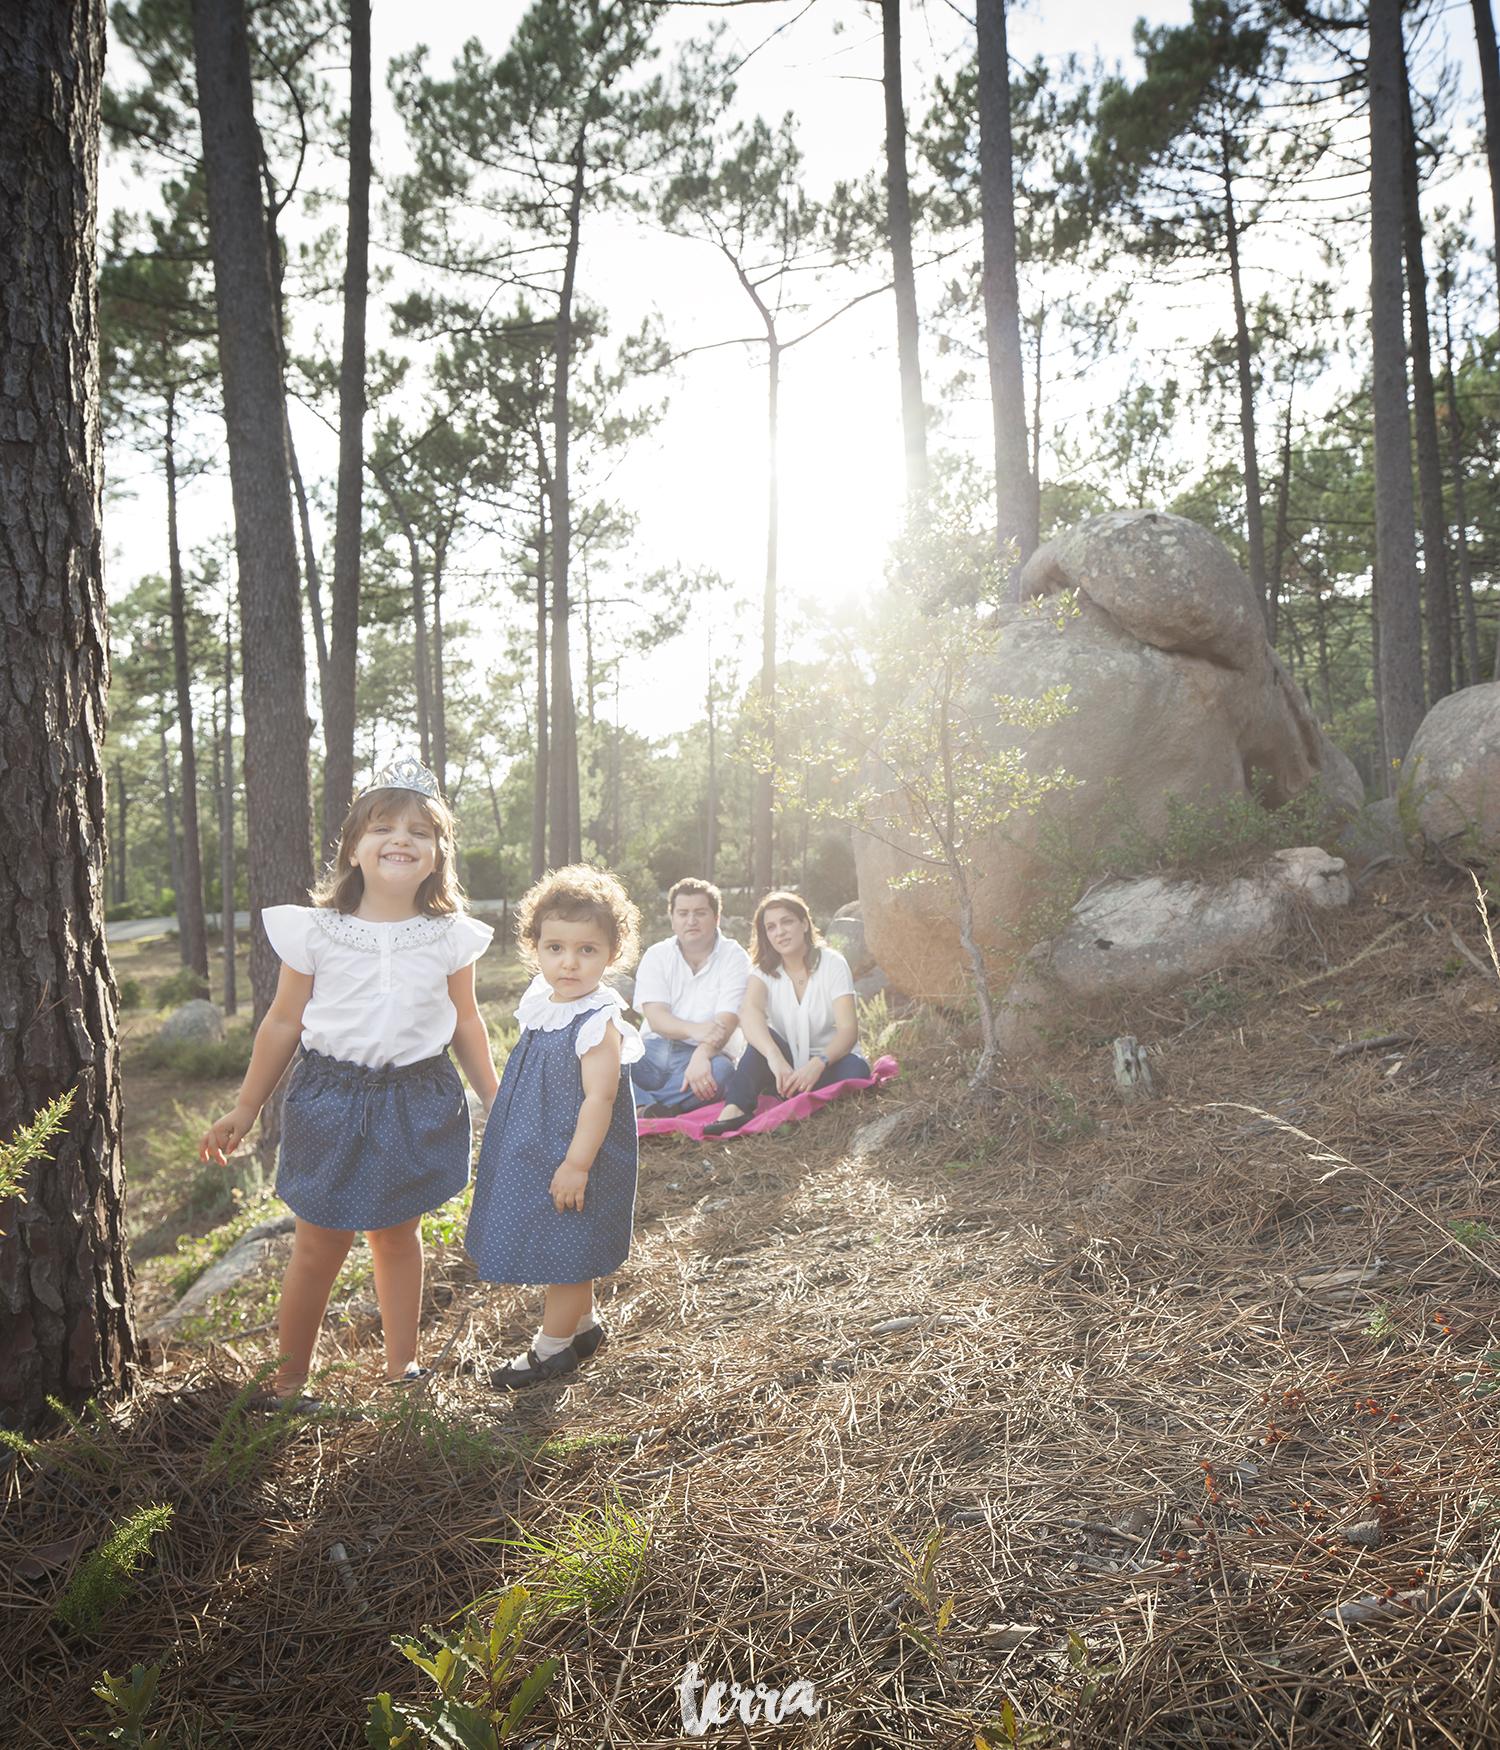 sessao-fotografica-familia-serra-sintra-portugal-terra-fotografia-03.jpg